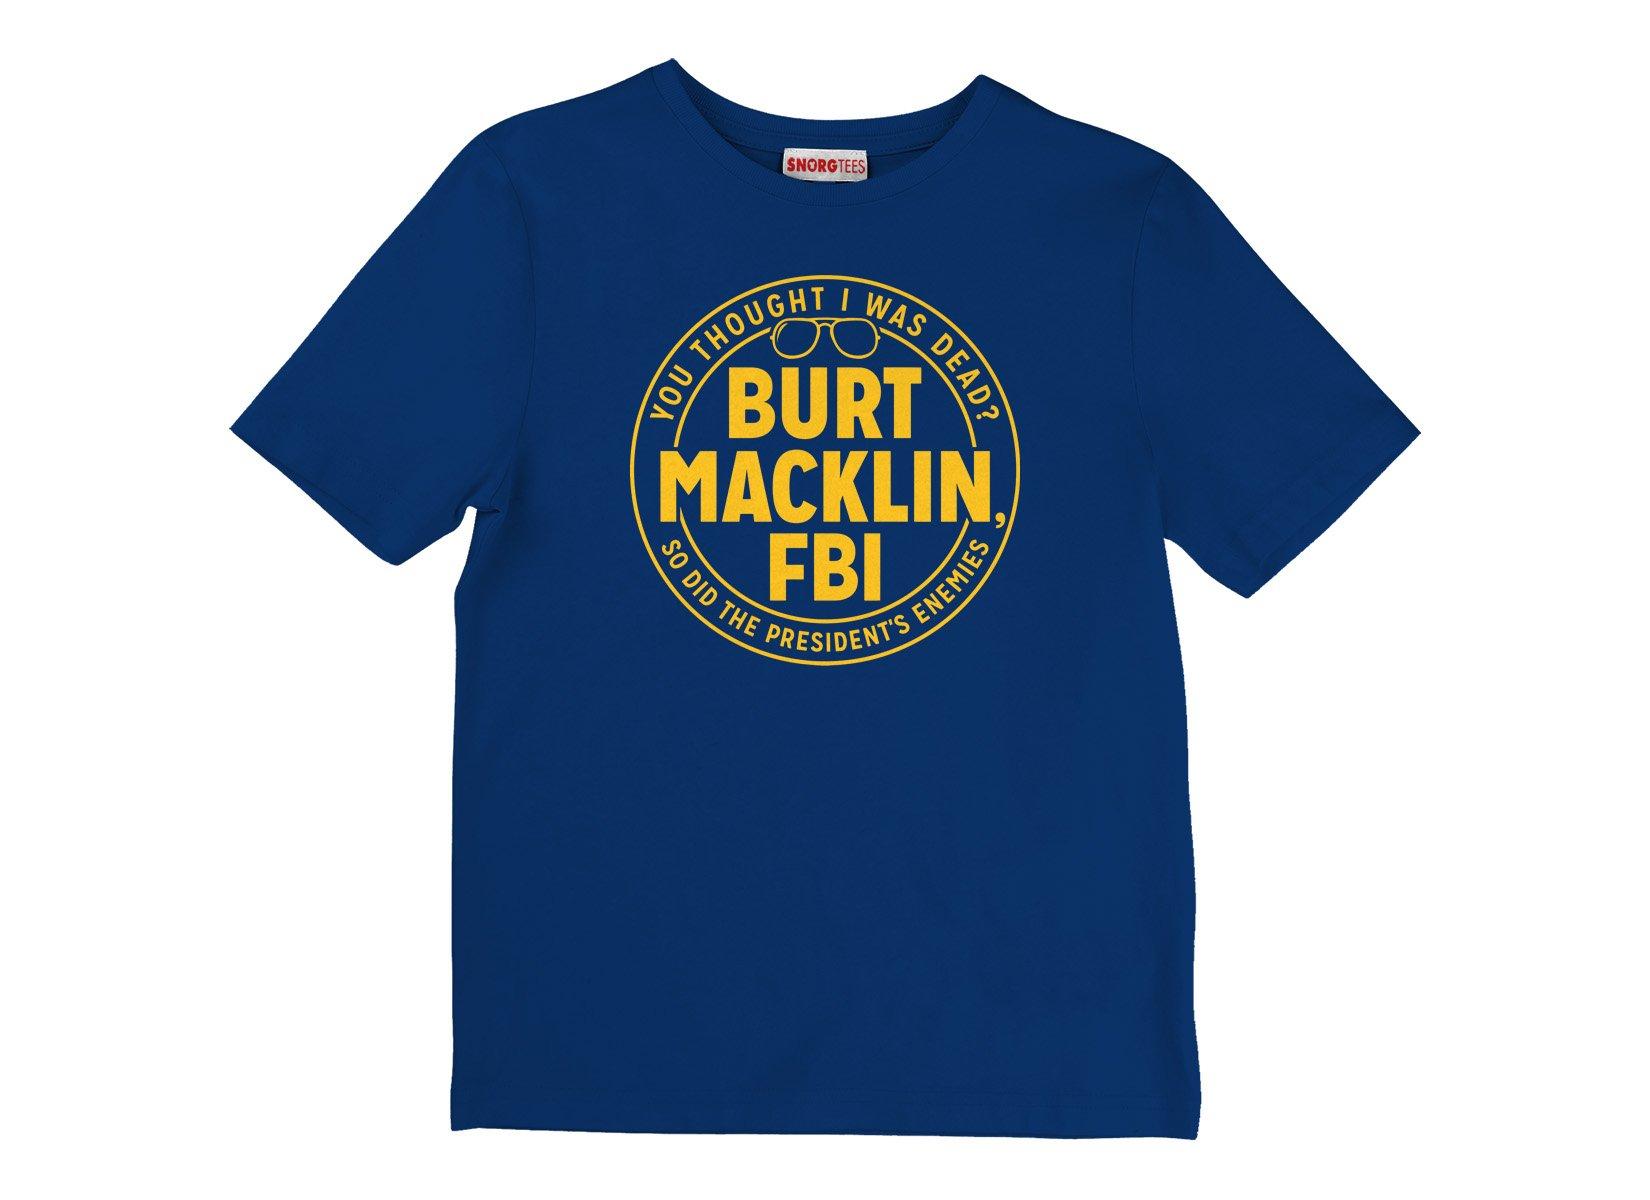 Burt Macklin, FBI on Kids T-Shirt